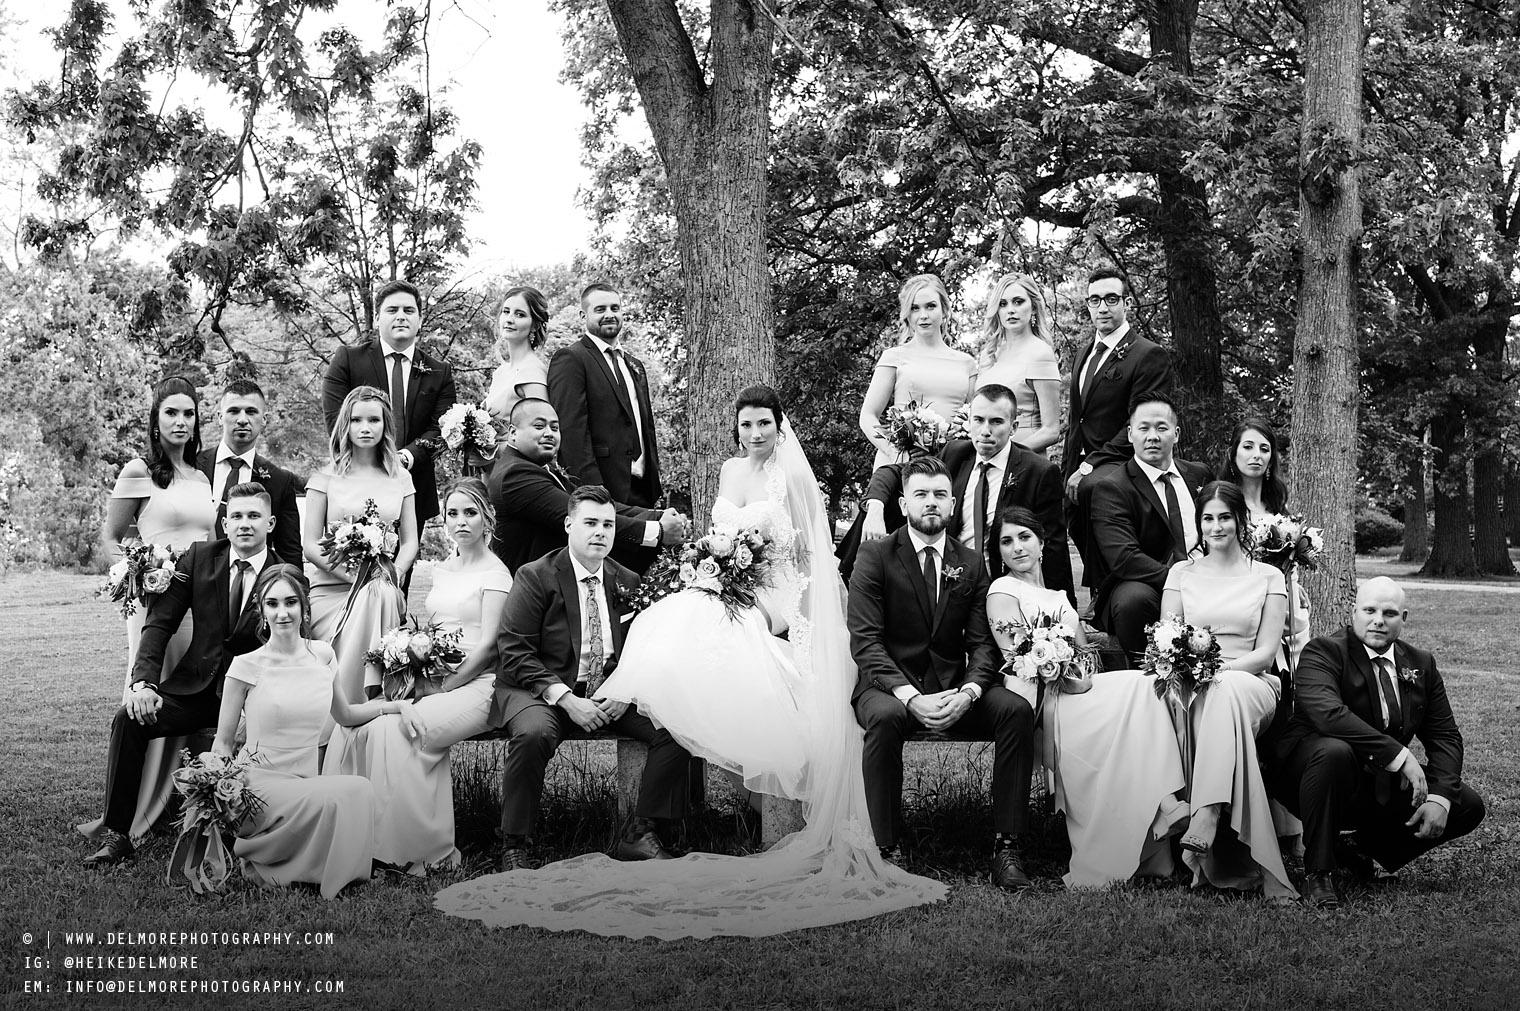 Windsor Wedding Photography Vanity Fair